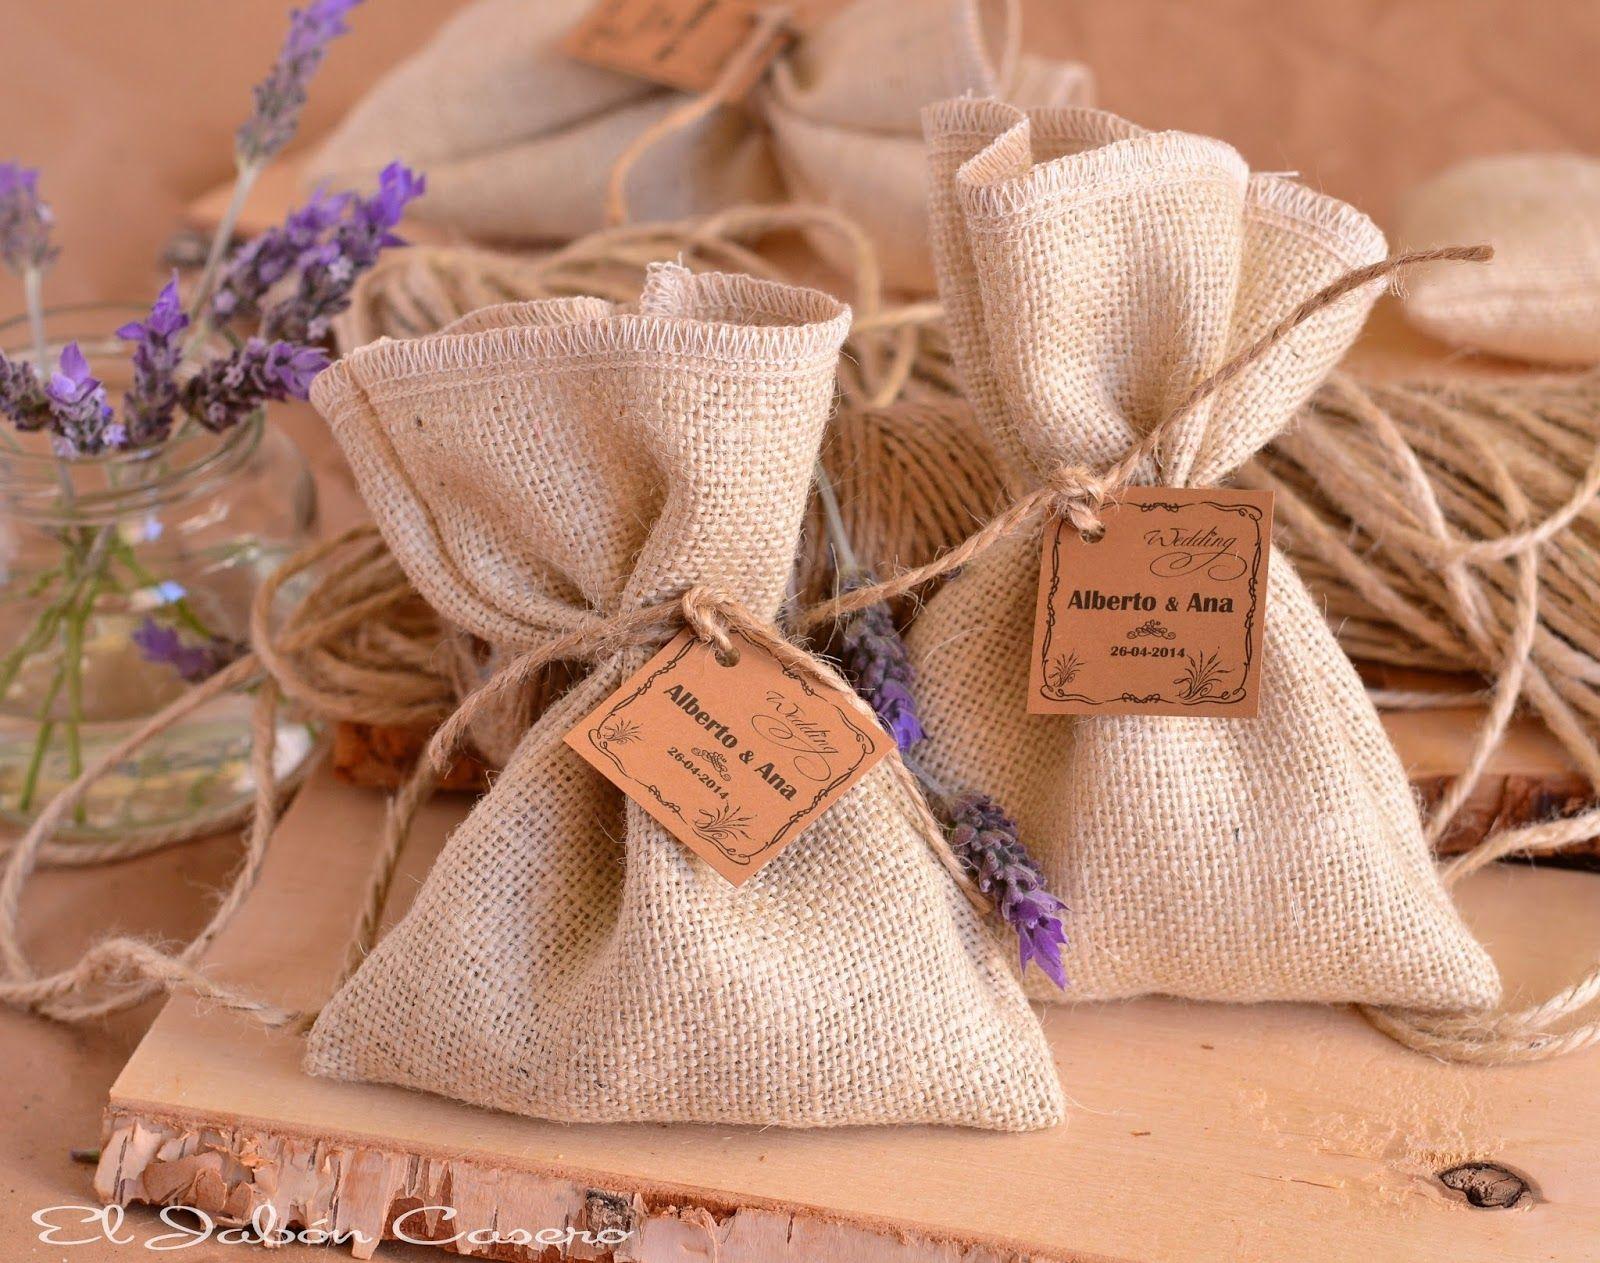 saquito lavanda detalle invitados bodas regalo invitados essencia novias bodas sevilla